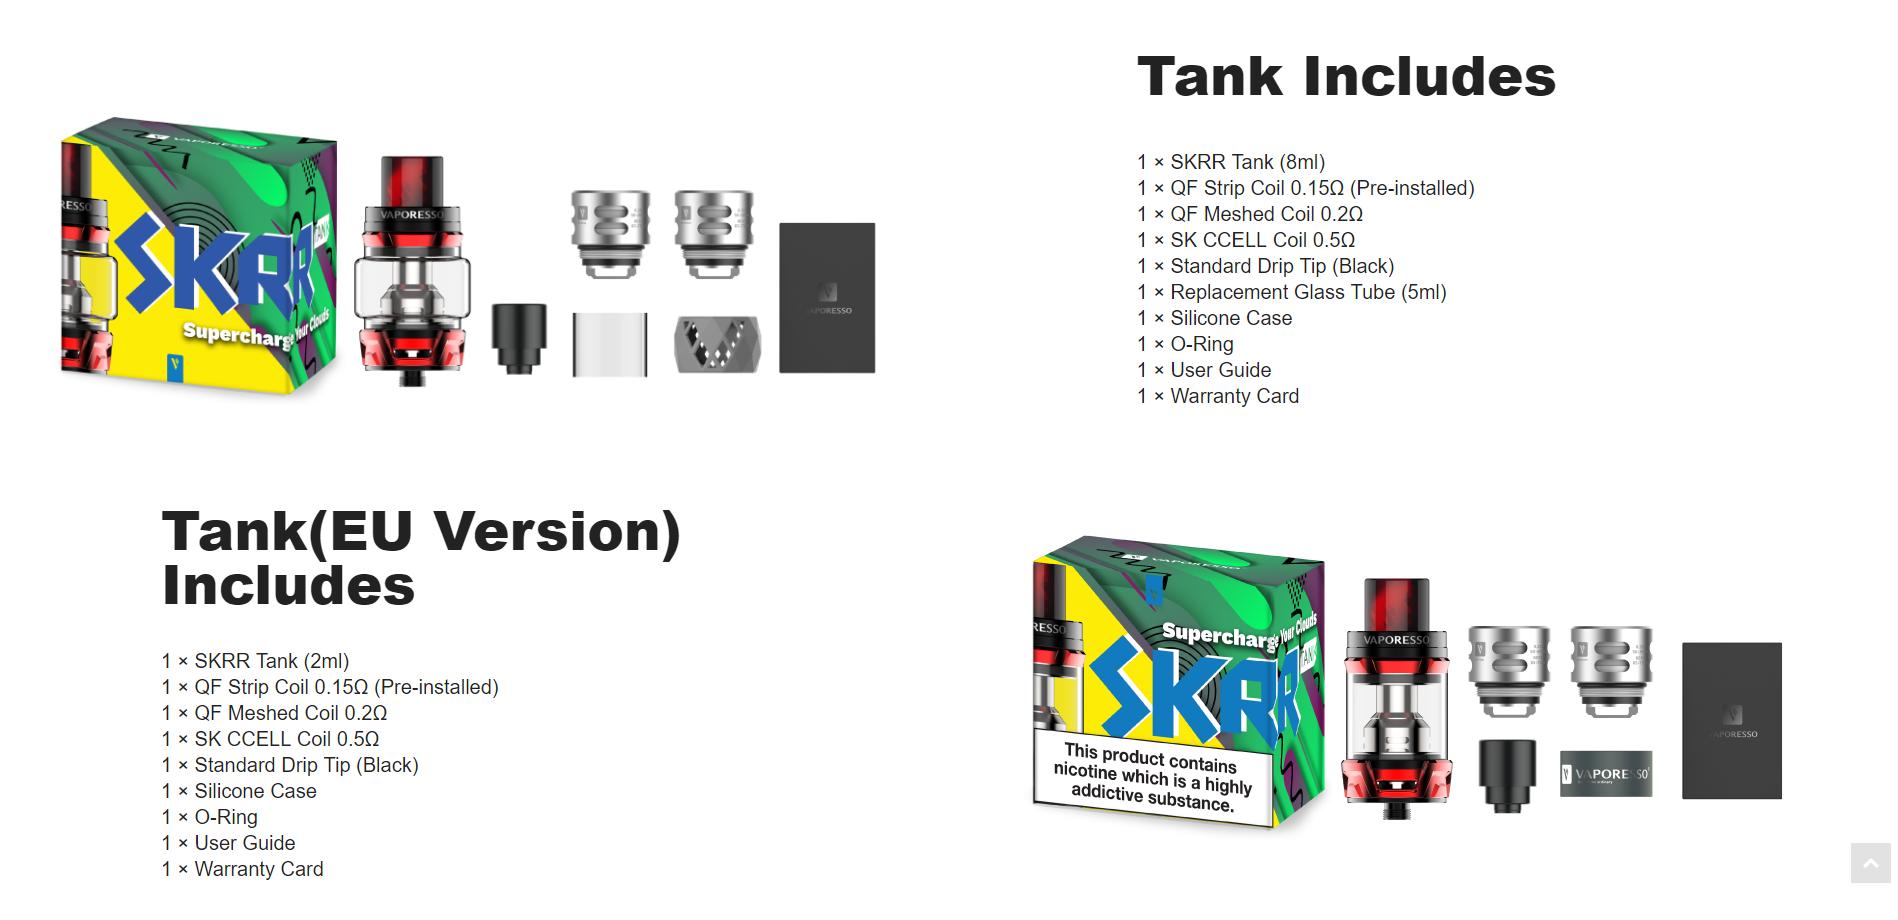 Vaporesso SKRR Tank kopen, Vaporesso SKRR Tank kopen Belgie, Vaporesso SKRR Tank kopen Nederland, Vaporesso SKRR Tank kopen online